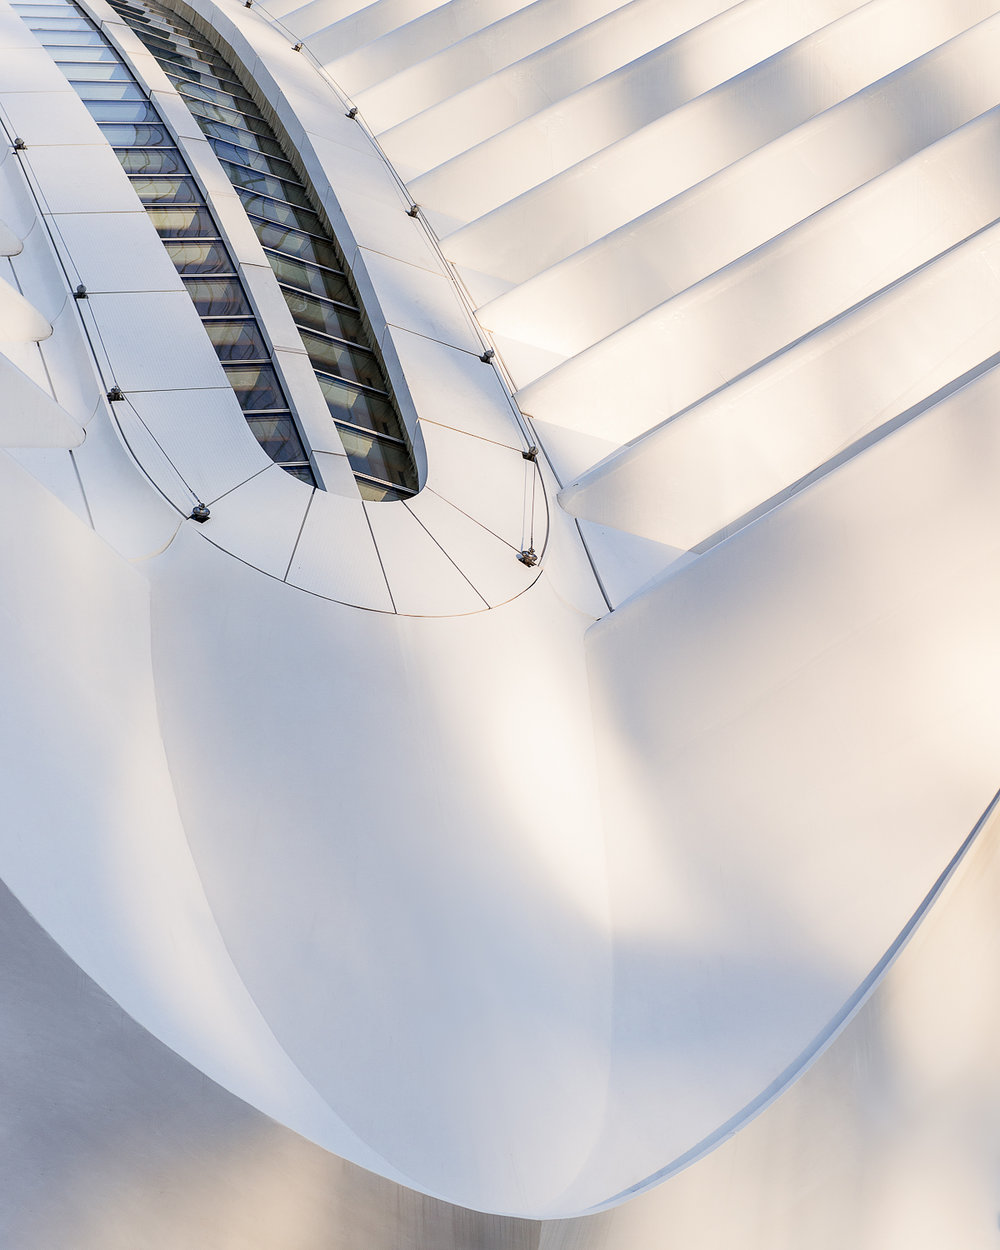 Oculus roof line